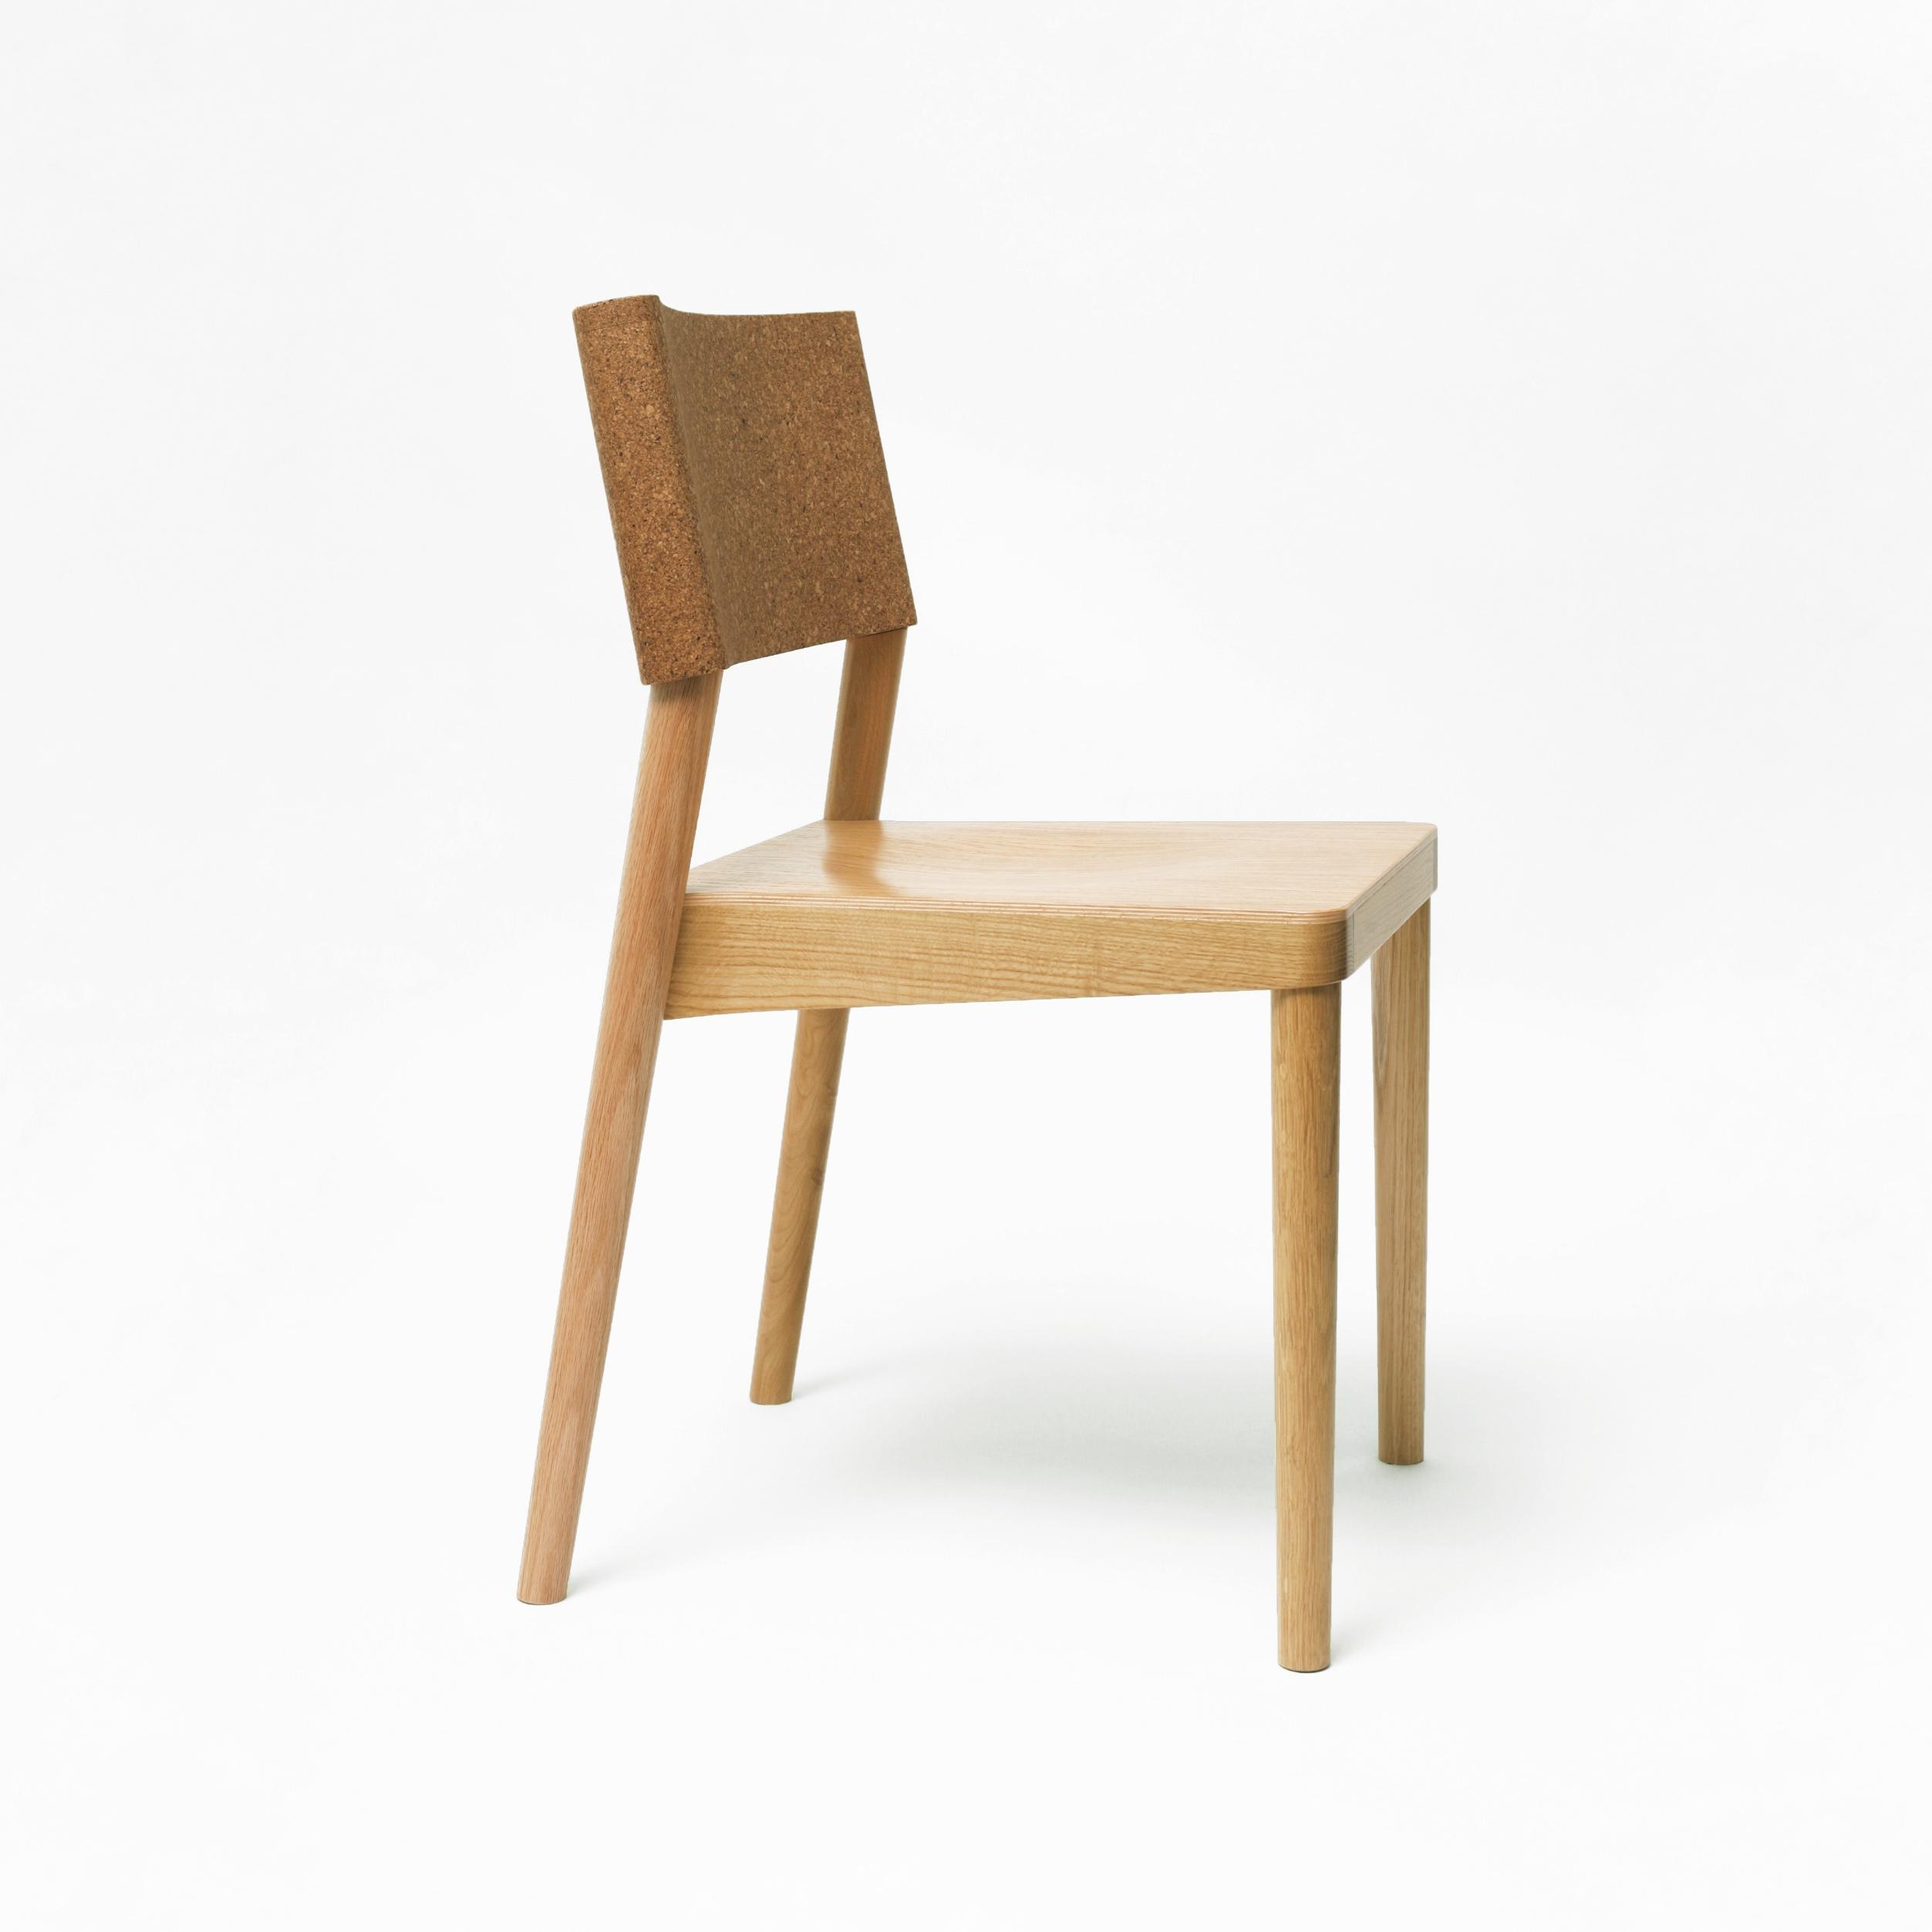 corkback chair_1 edit_square